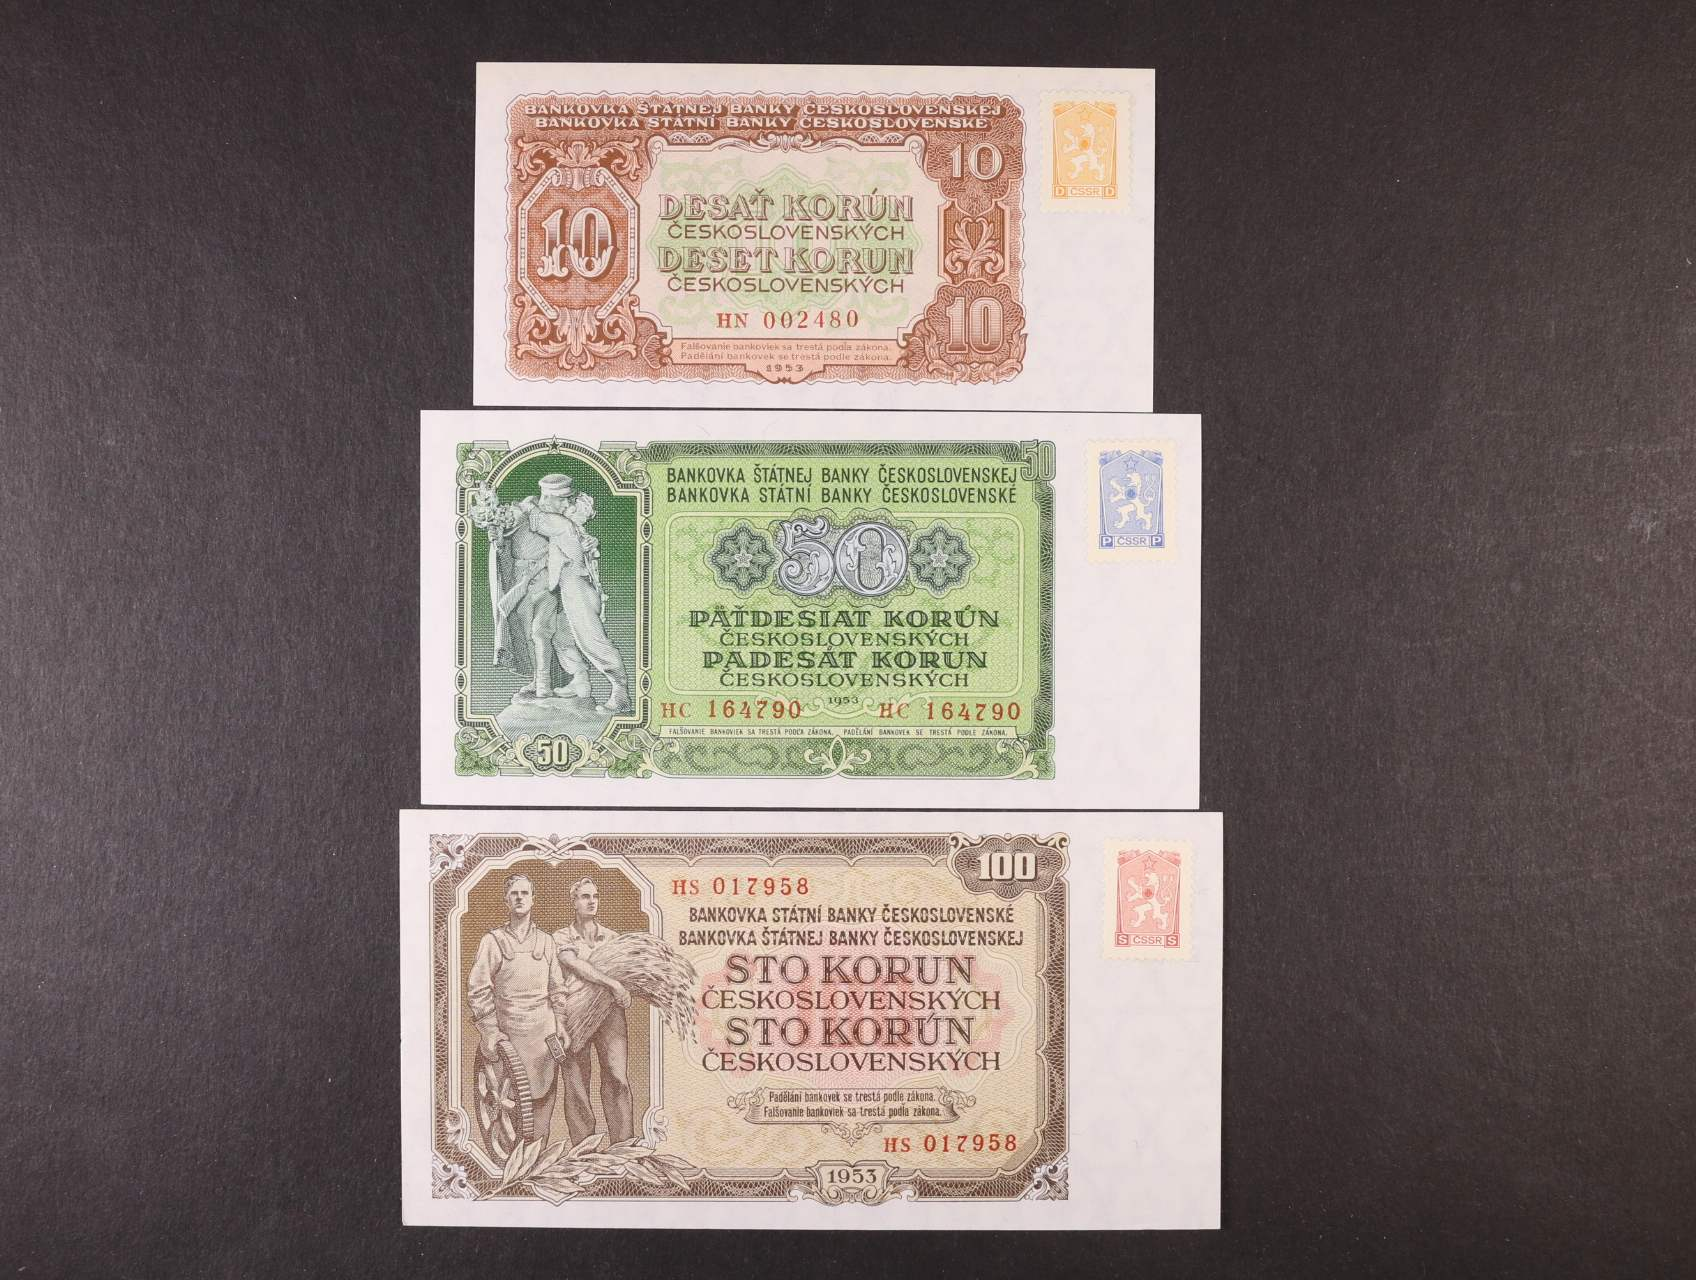 sada nevydaných kolků vzoru 1962 s ozn. D, P, S, nalepené na bankovách 10 Kčs, 50 Kčs a 100 Kčs 1953, jedna z teoretických možností dobového použití